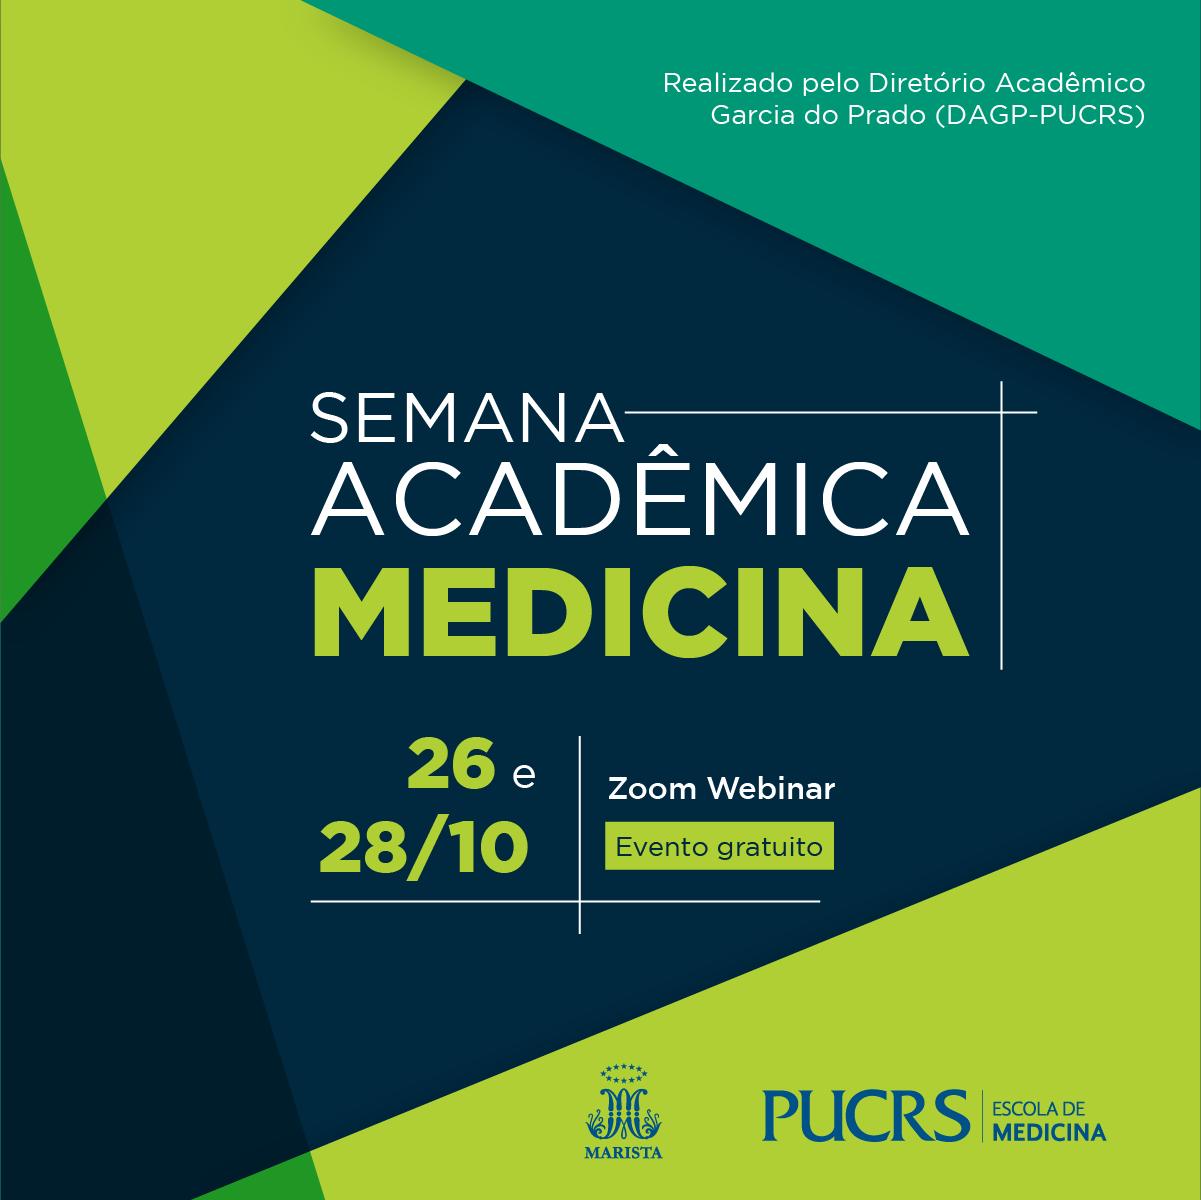 III Semana Acadêmica da Escola de Medicina